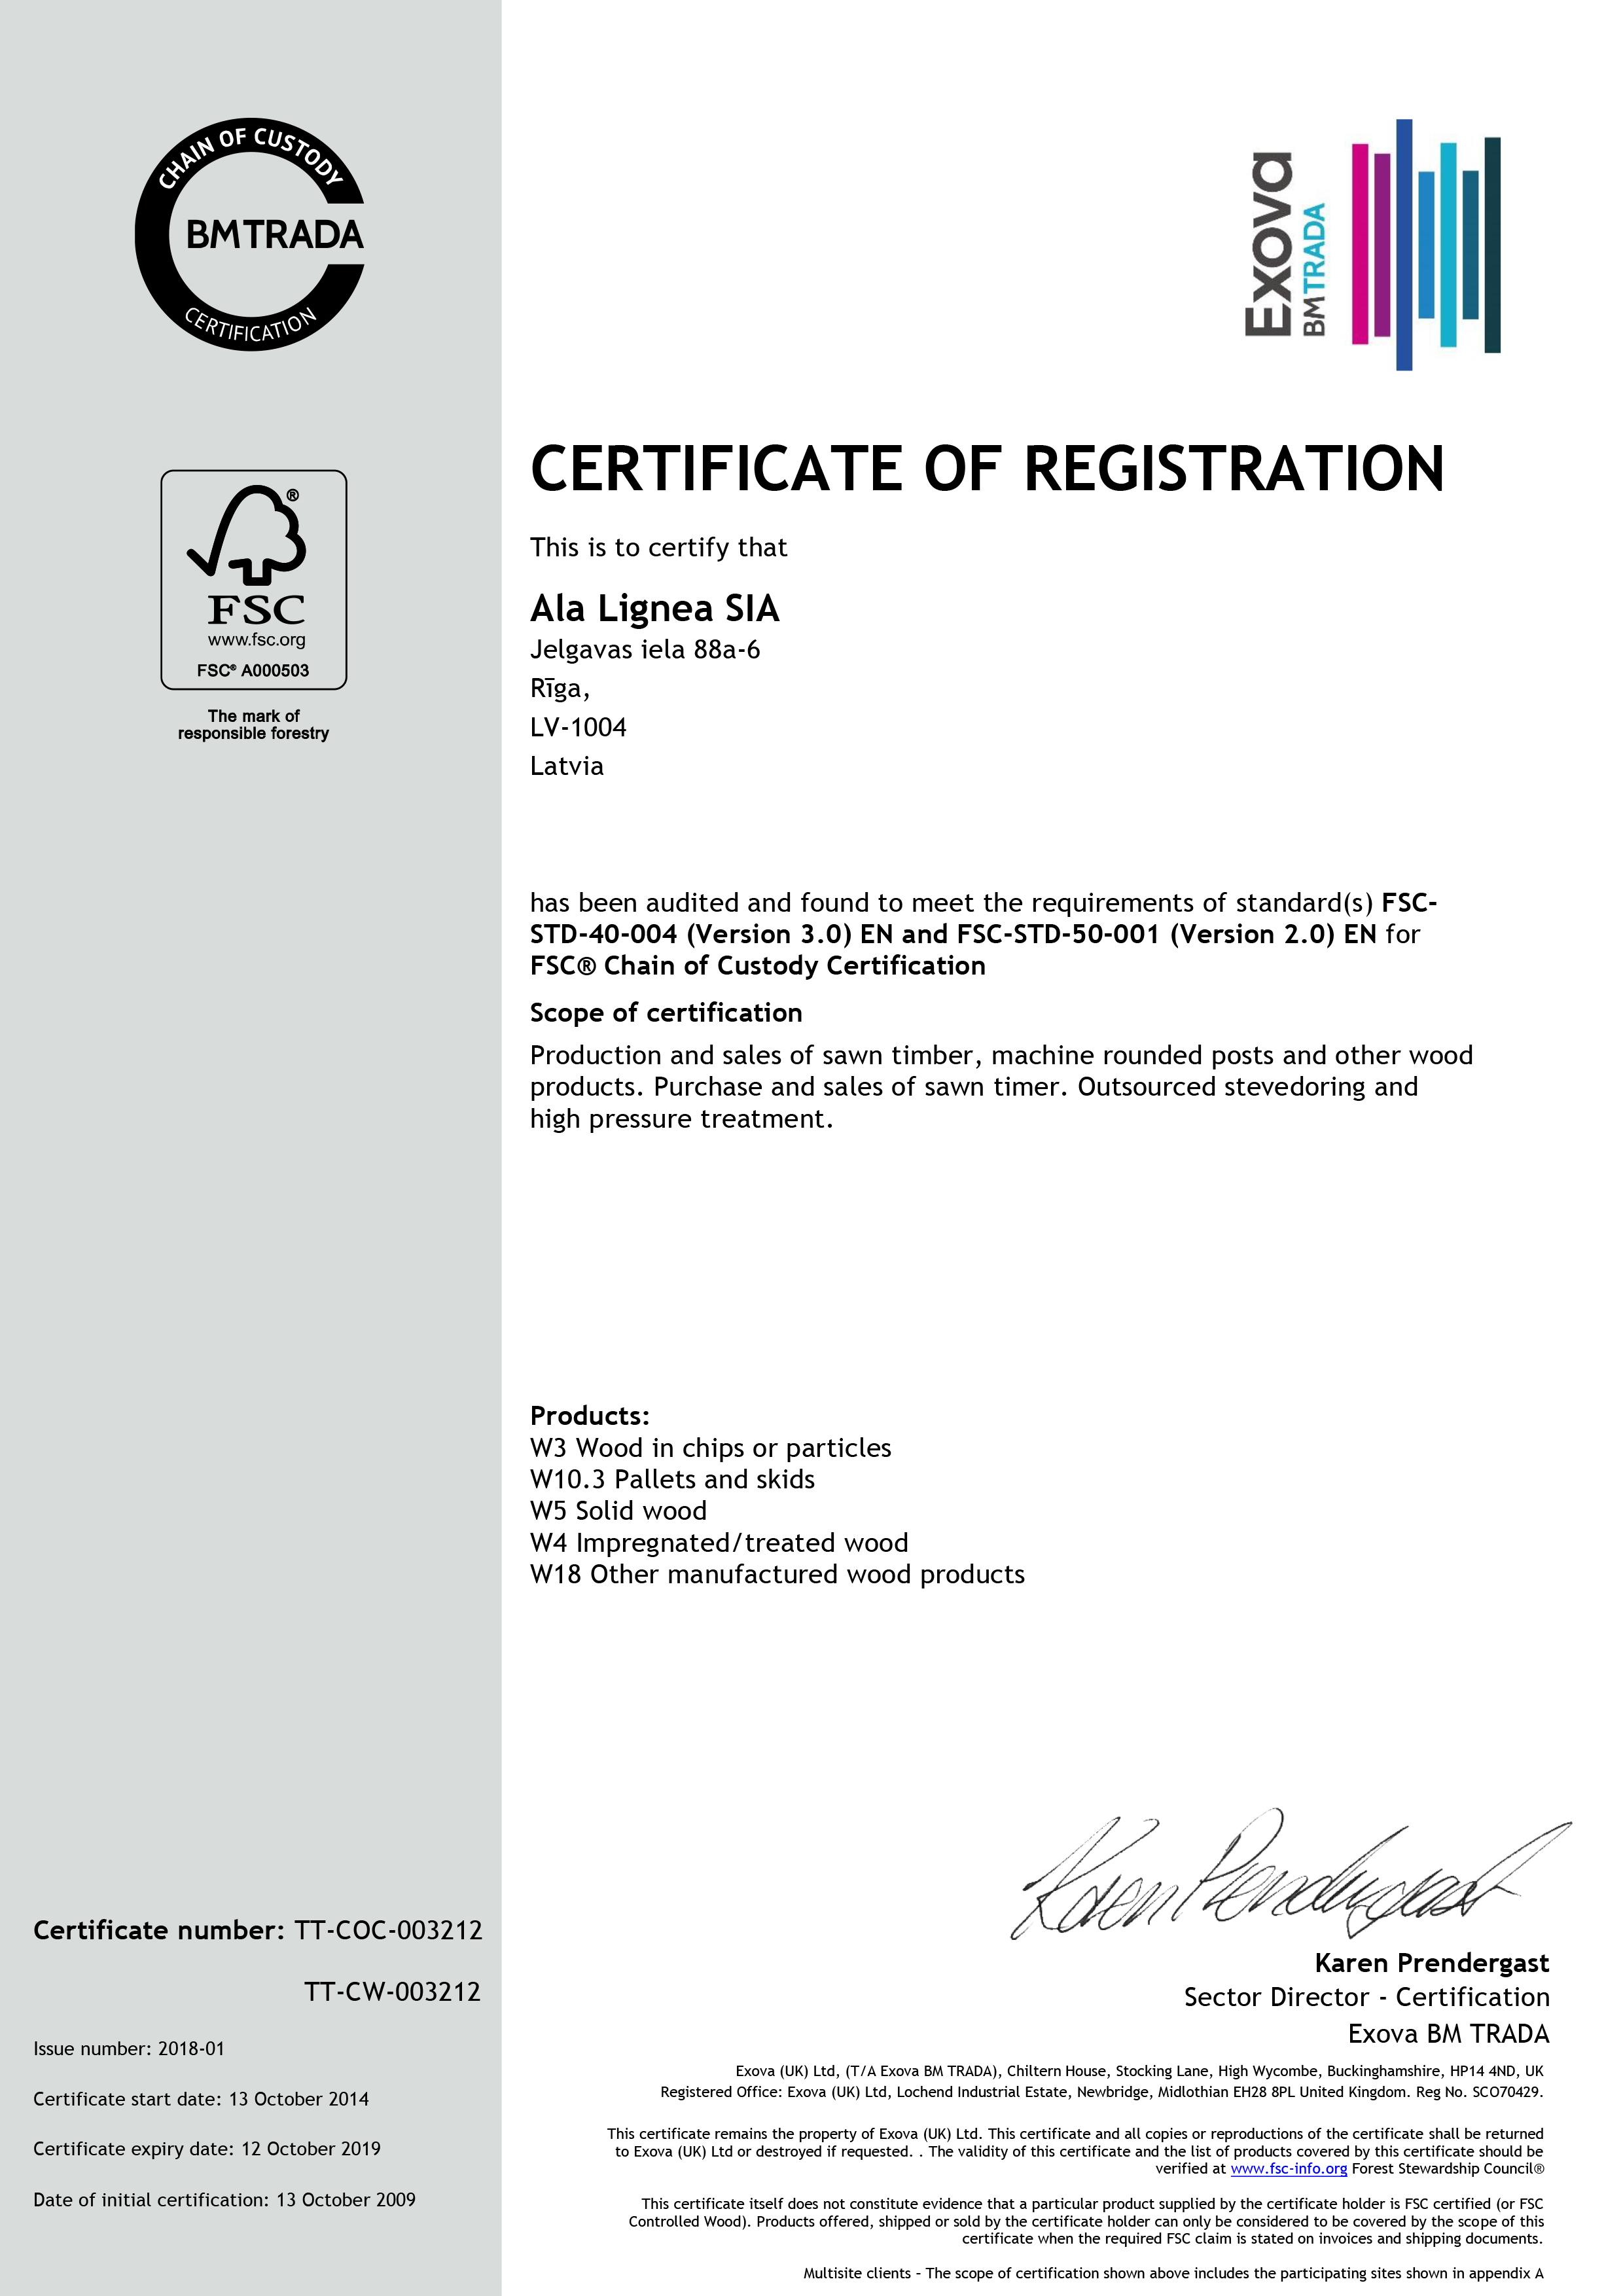 ala-lignea-sfc-sertifikats